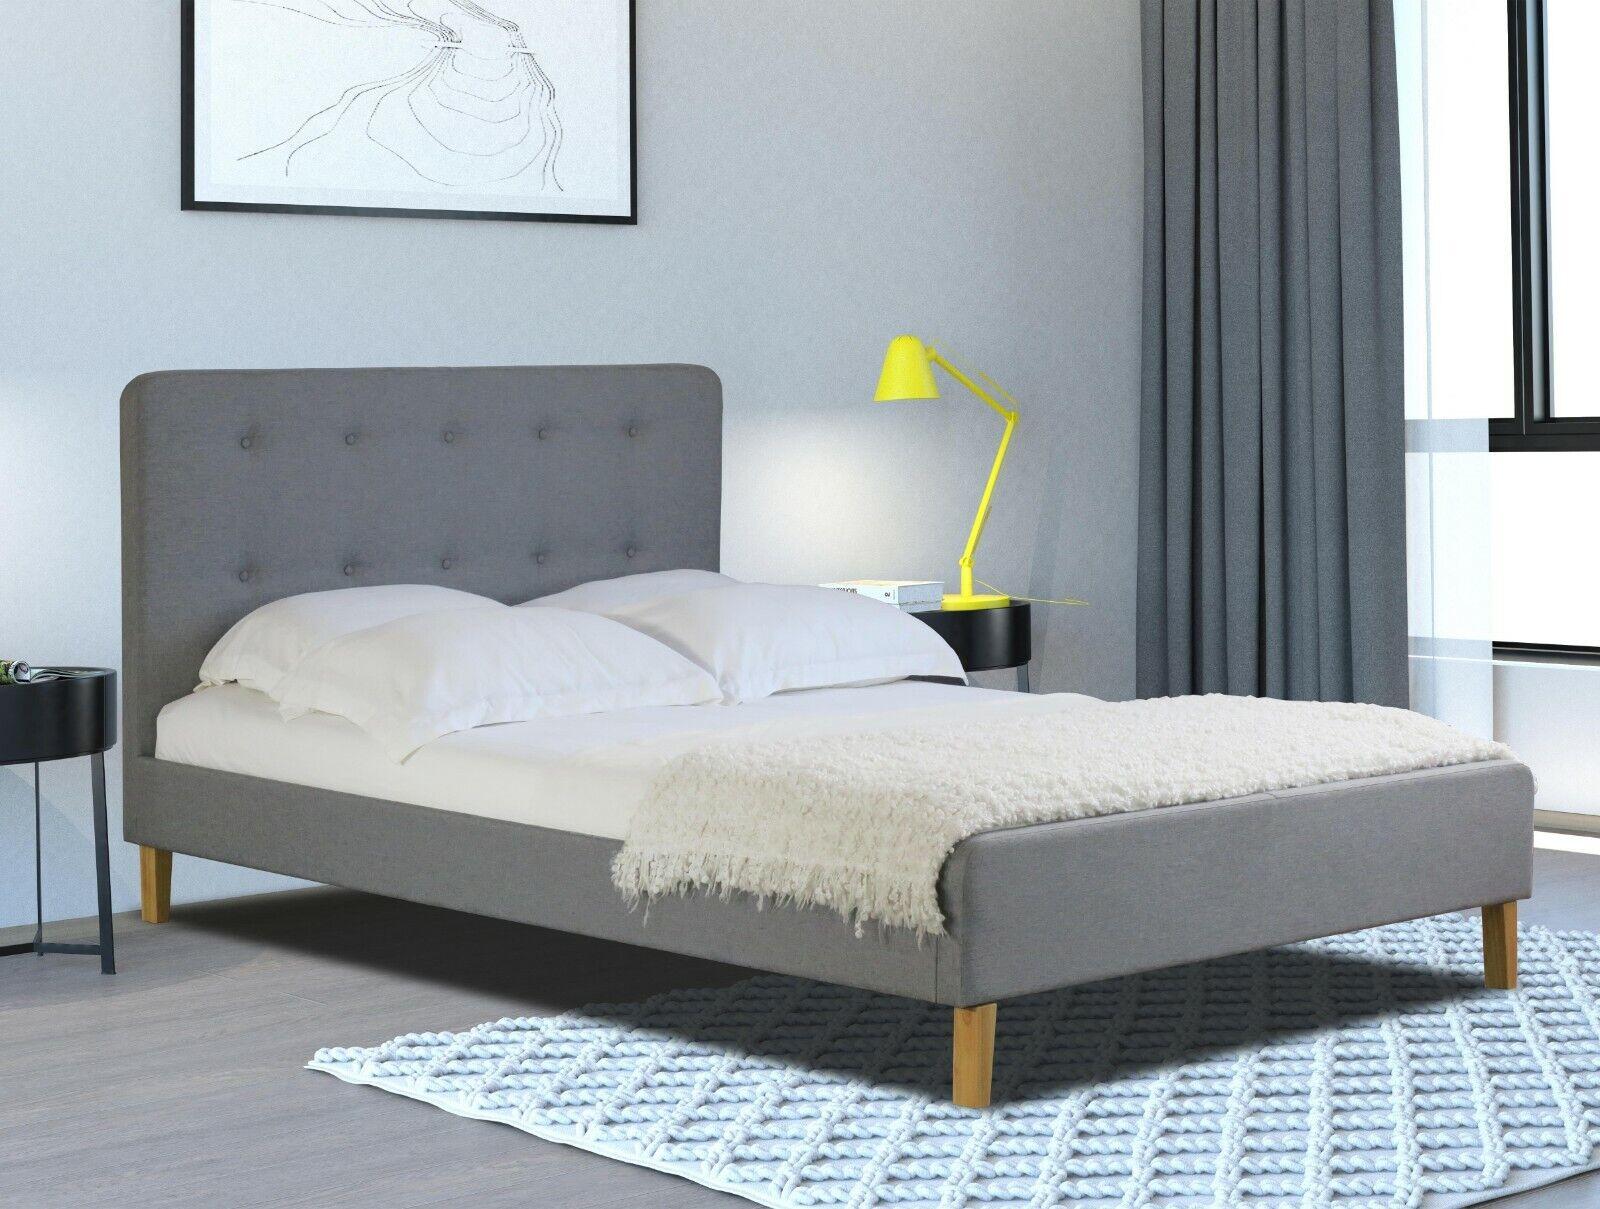 Ashley Furniture B705 Ledelle Queen King Sleigh Bed Frame Bedroom Set W Marble For Sale Ebay